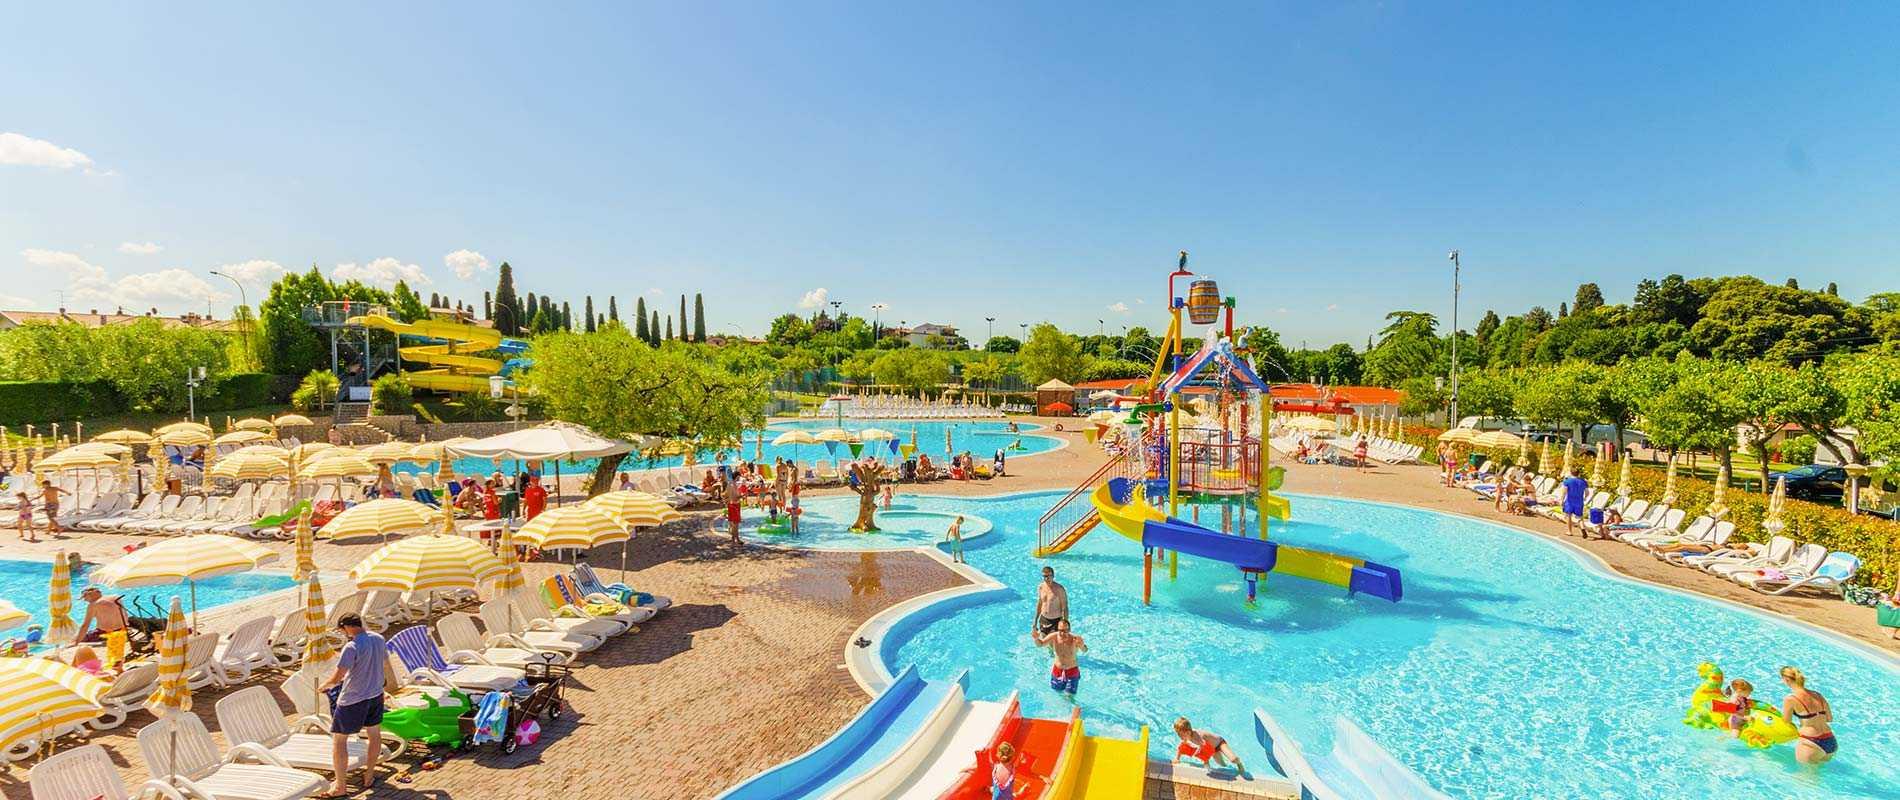 Camping spiaggia d 39 oro gardameer italie campingdreams - Campeggi con piscina lago di garda ...